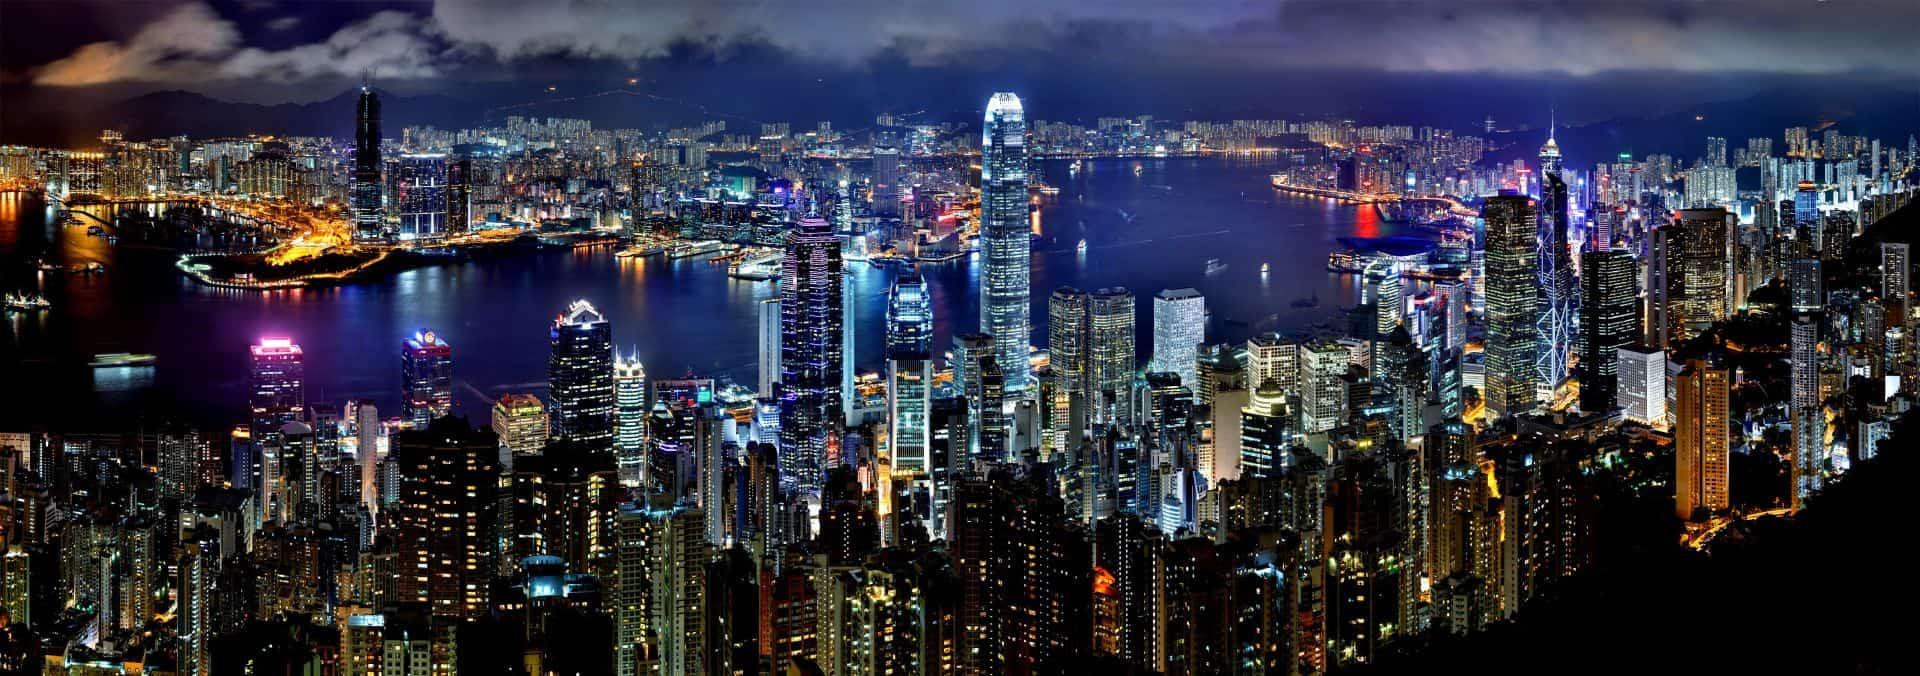 Hong Kong Night Skyline View From Peak